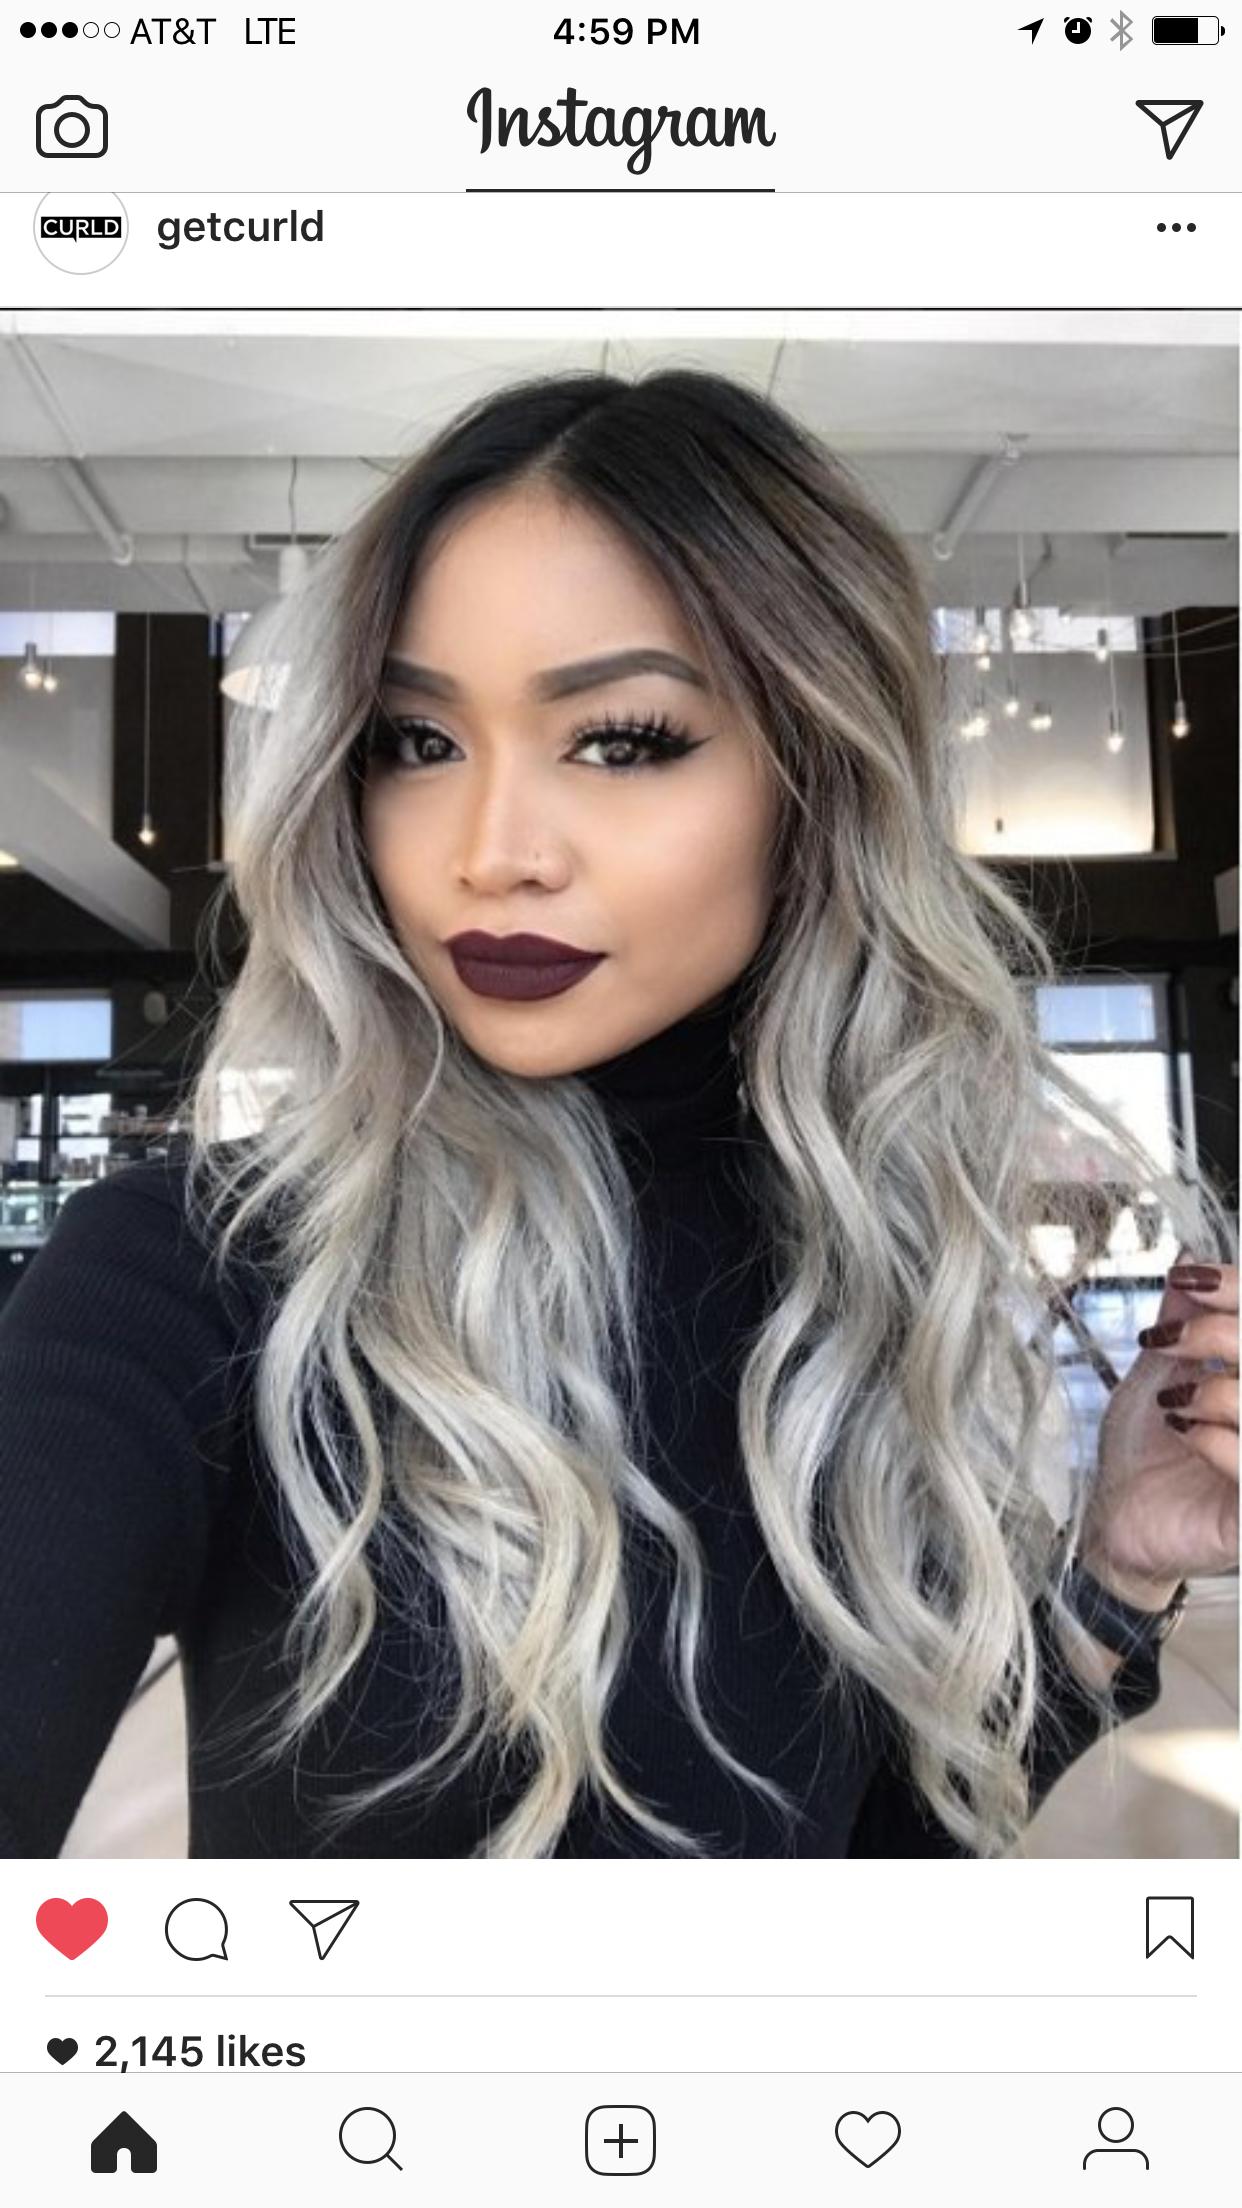 Half Black Half Silver Balayage Long Hair In 2020 Dying Your Hair Grey Silver Grey Hair Hair